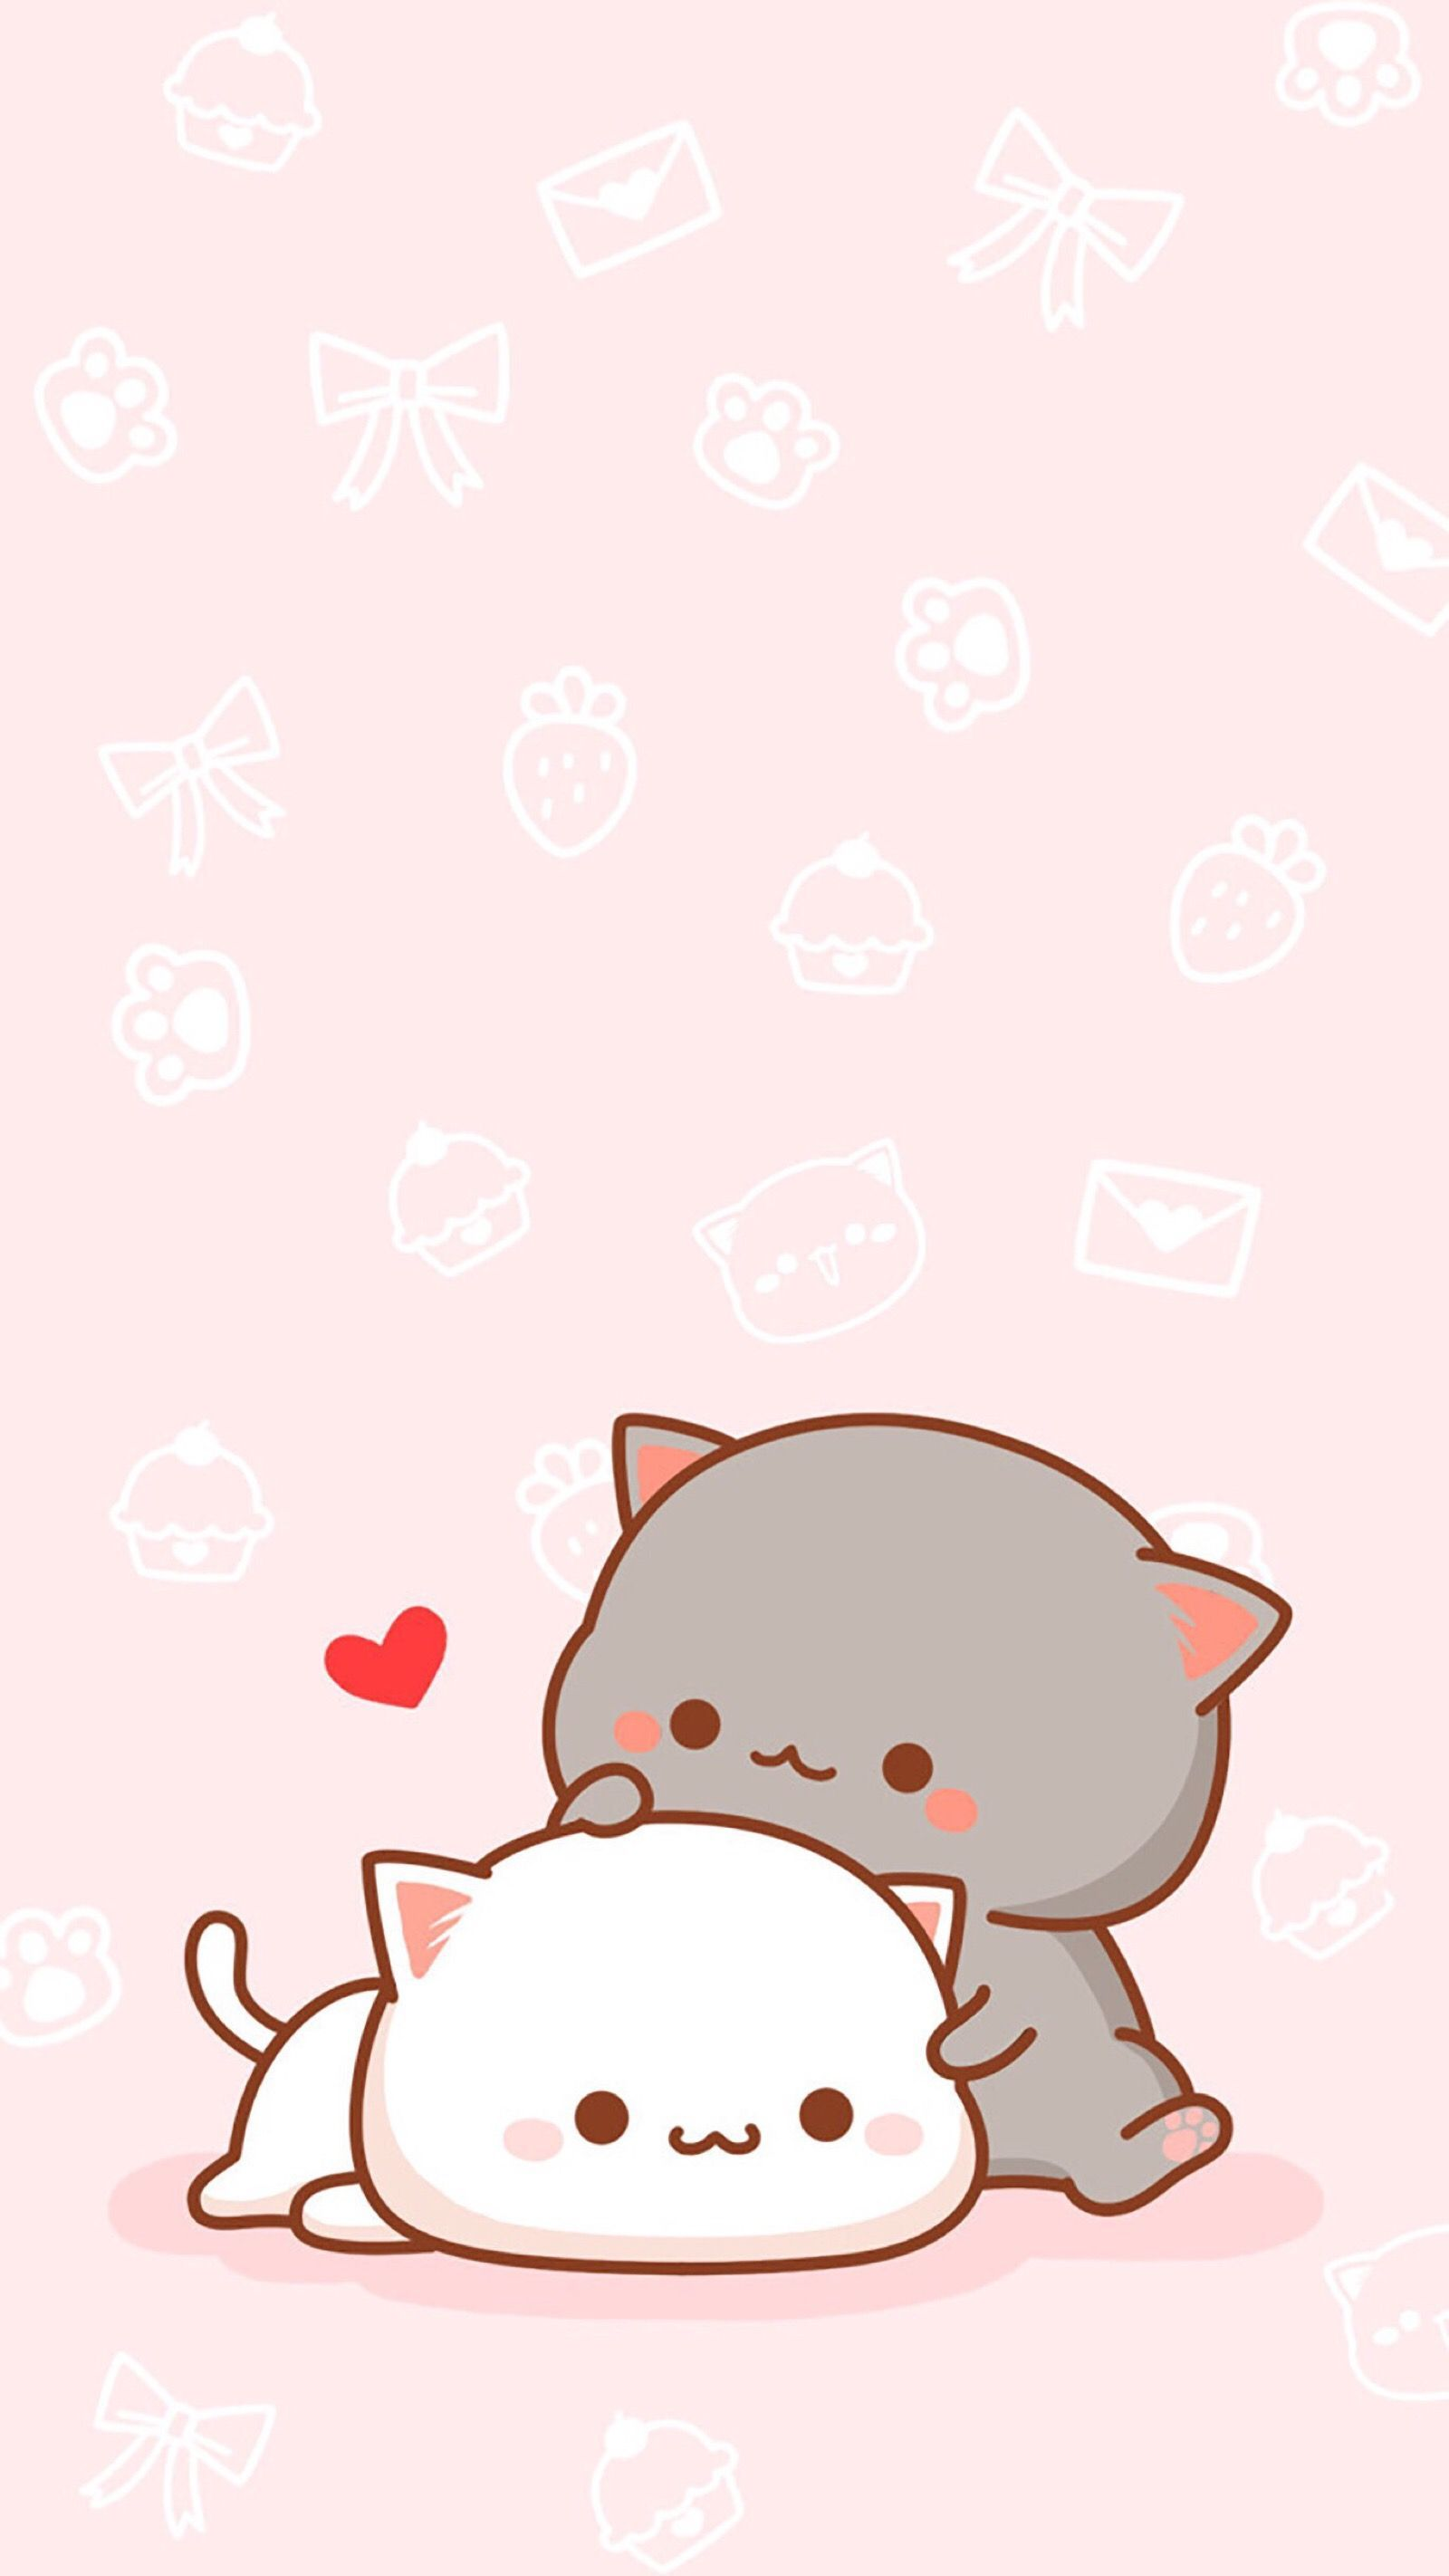 Cartoon Cat Iphone Wallpapers Top Free Cartoon Cat Iphone Backgrounds Wallpaperaccess